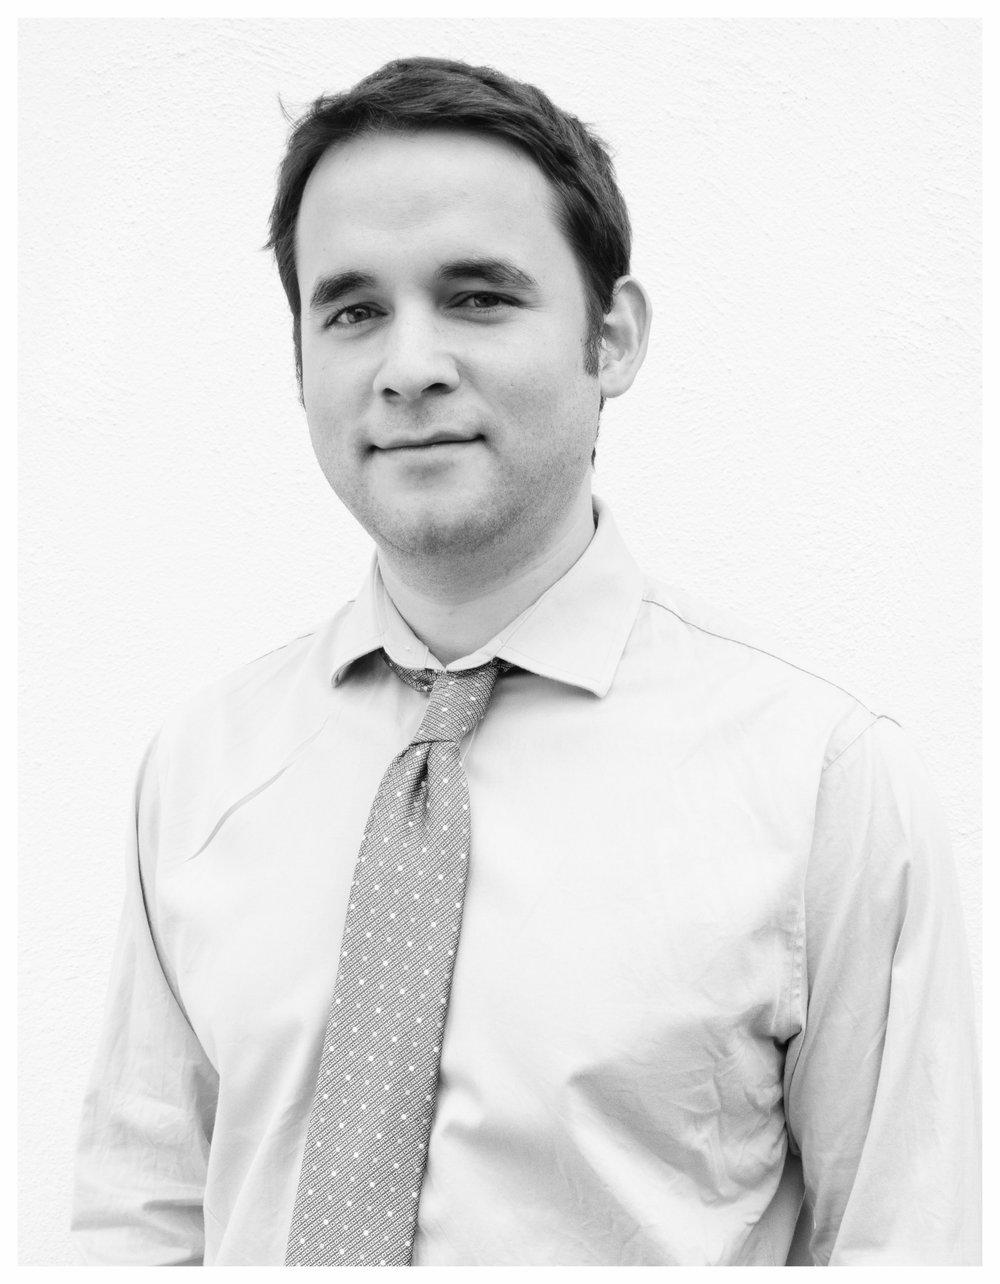 Cory Brown, Islander Engineering Victoria BC